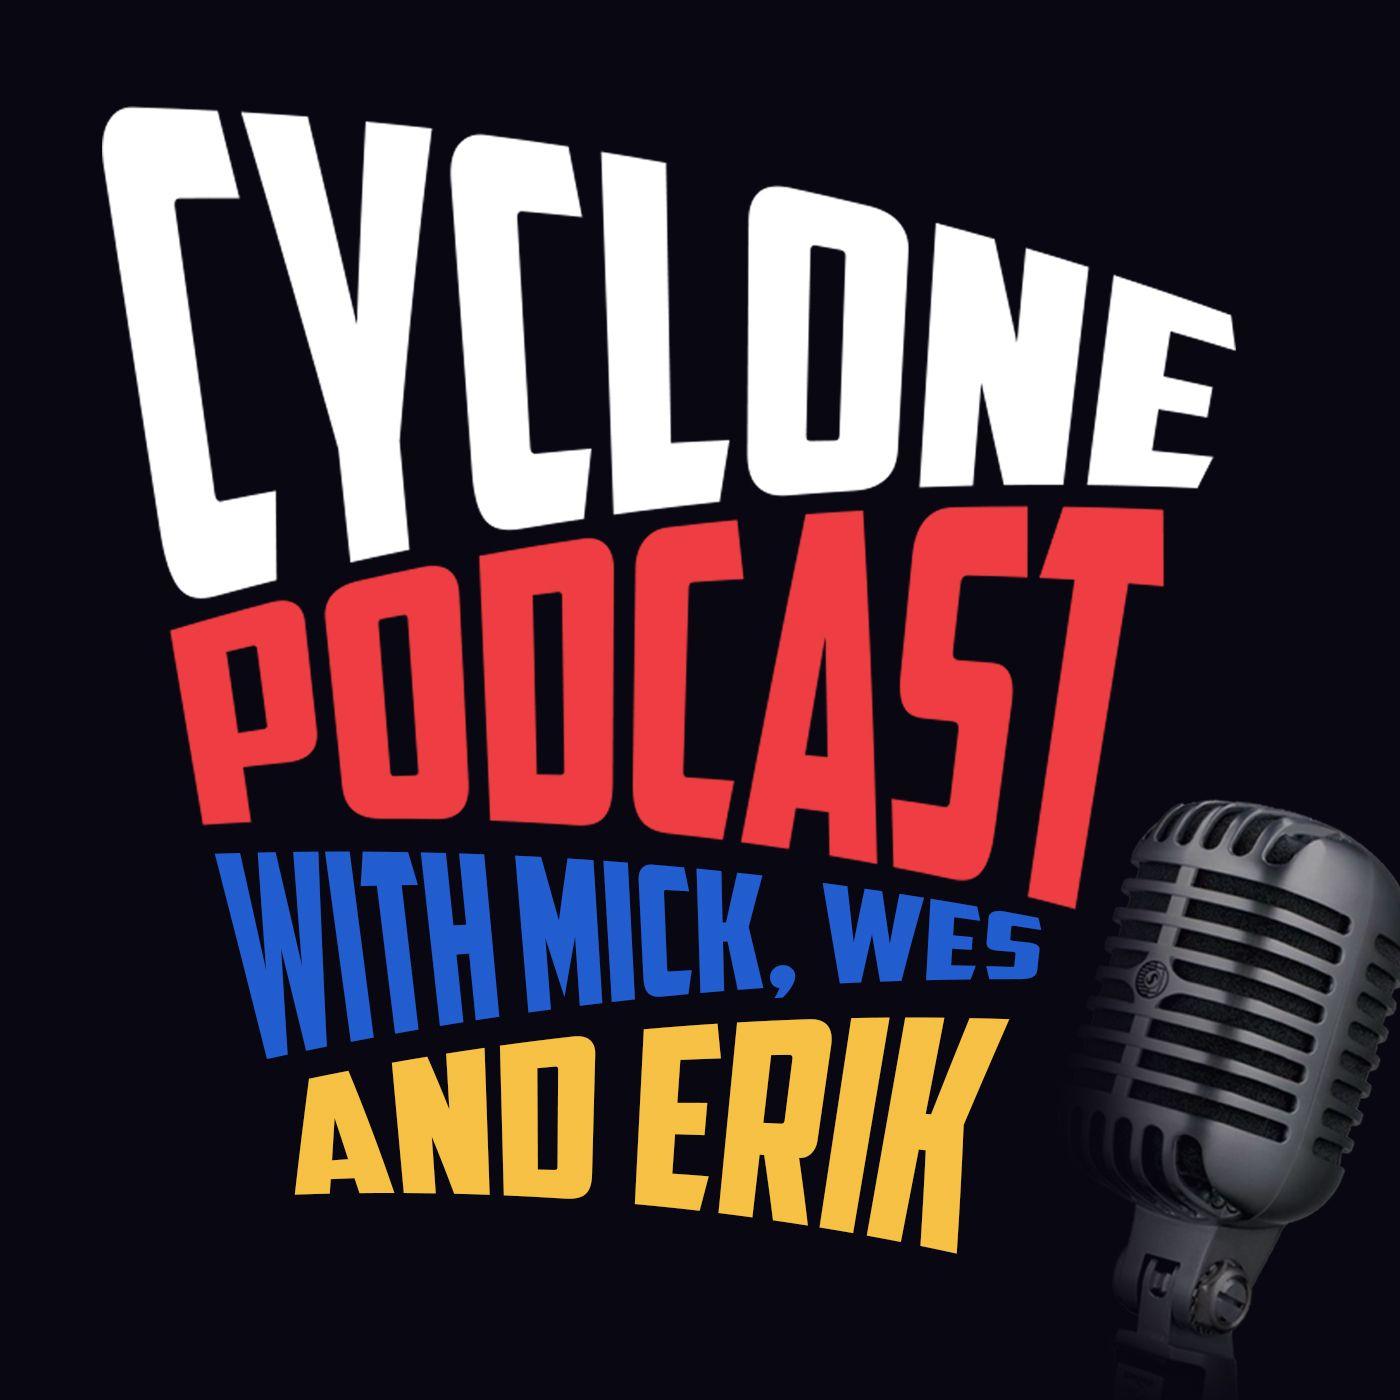 Clone Podcast